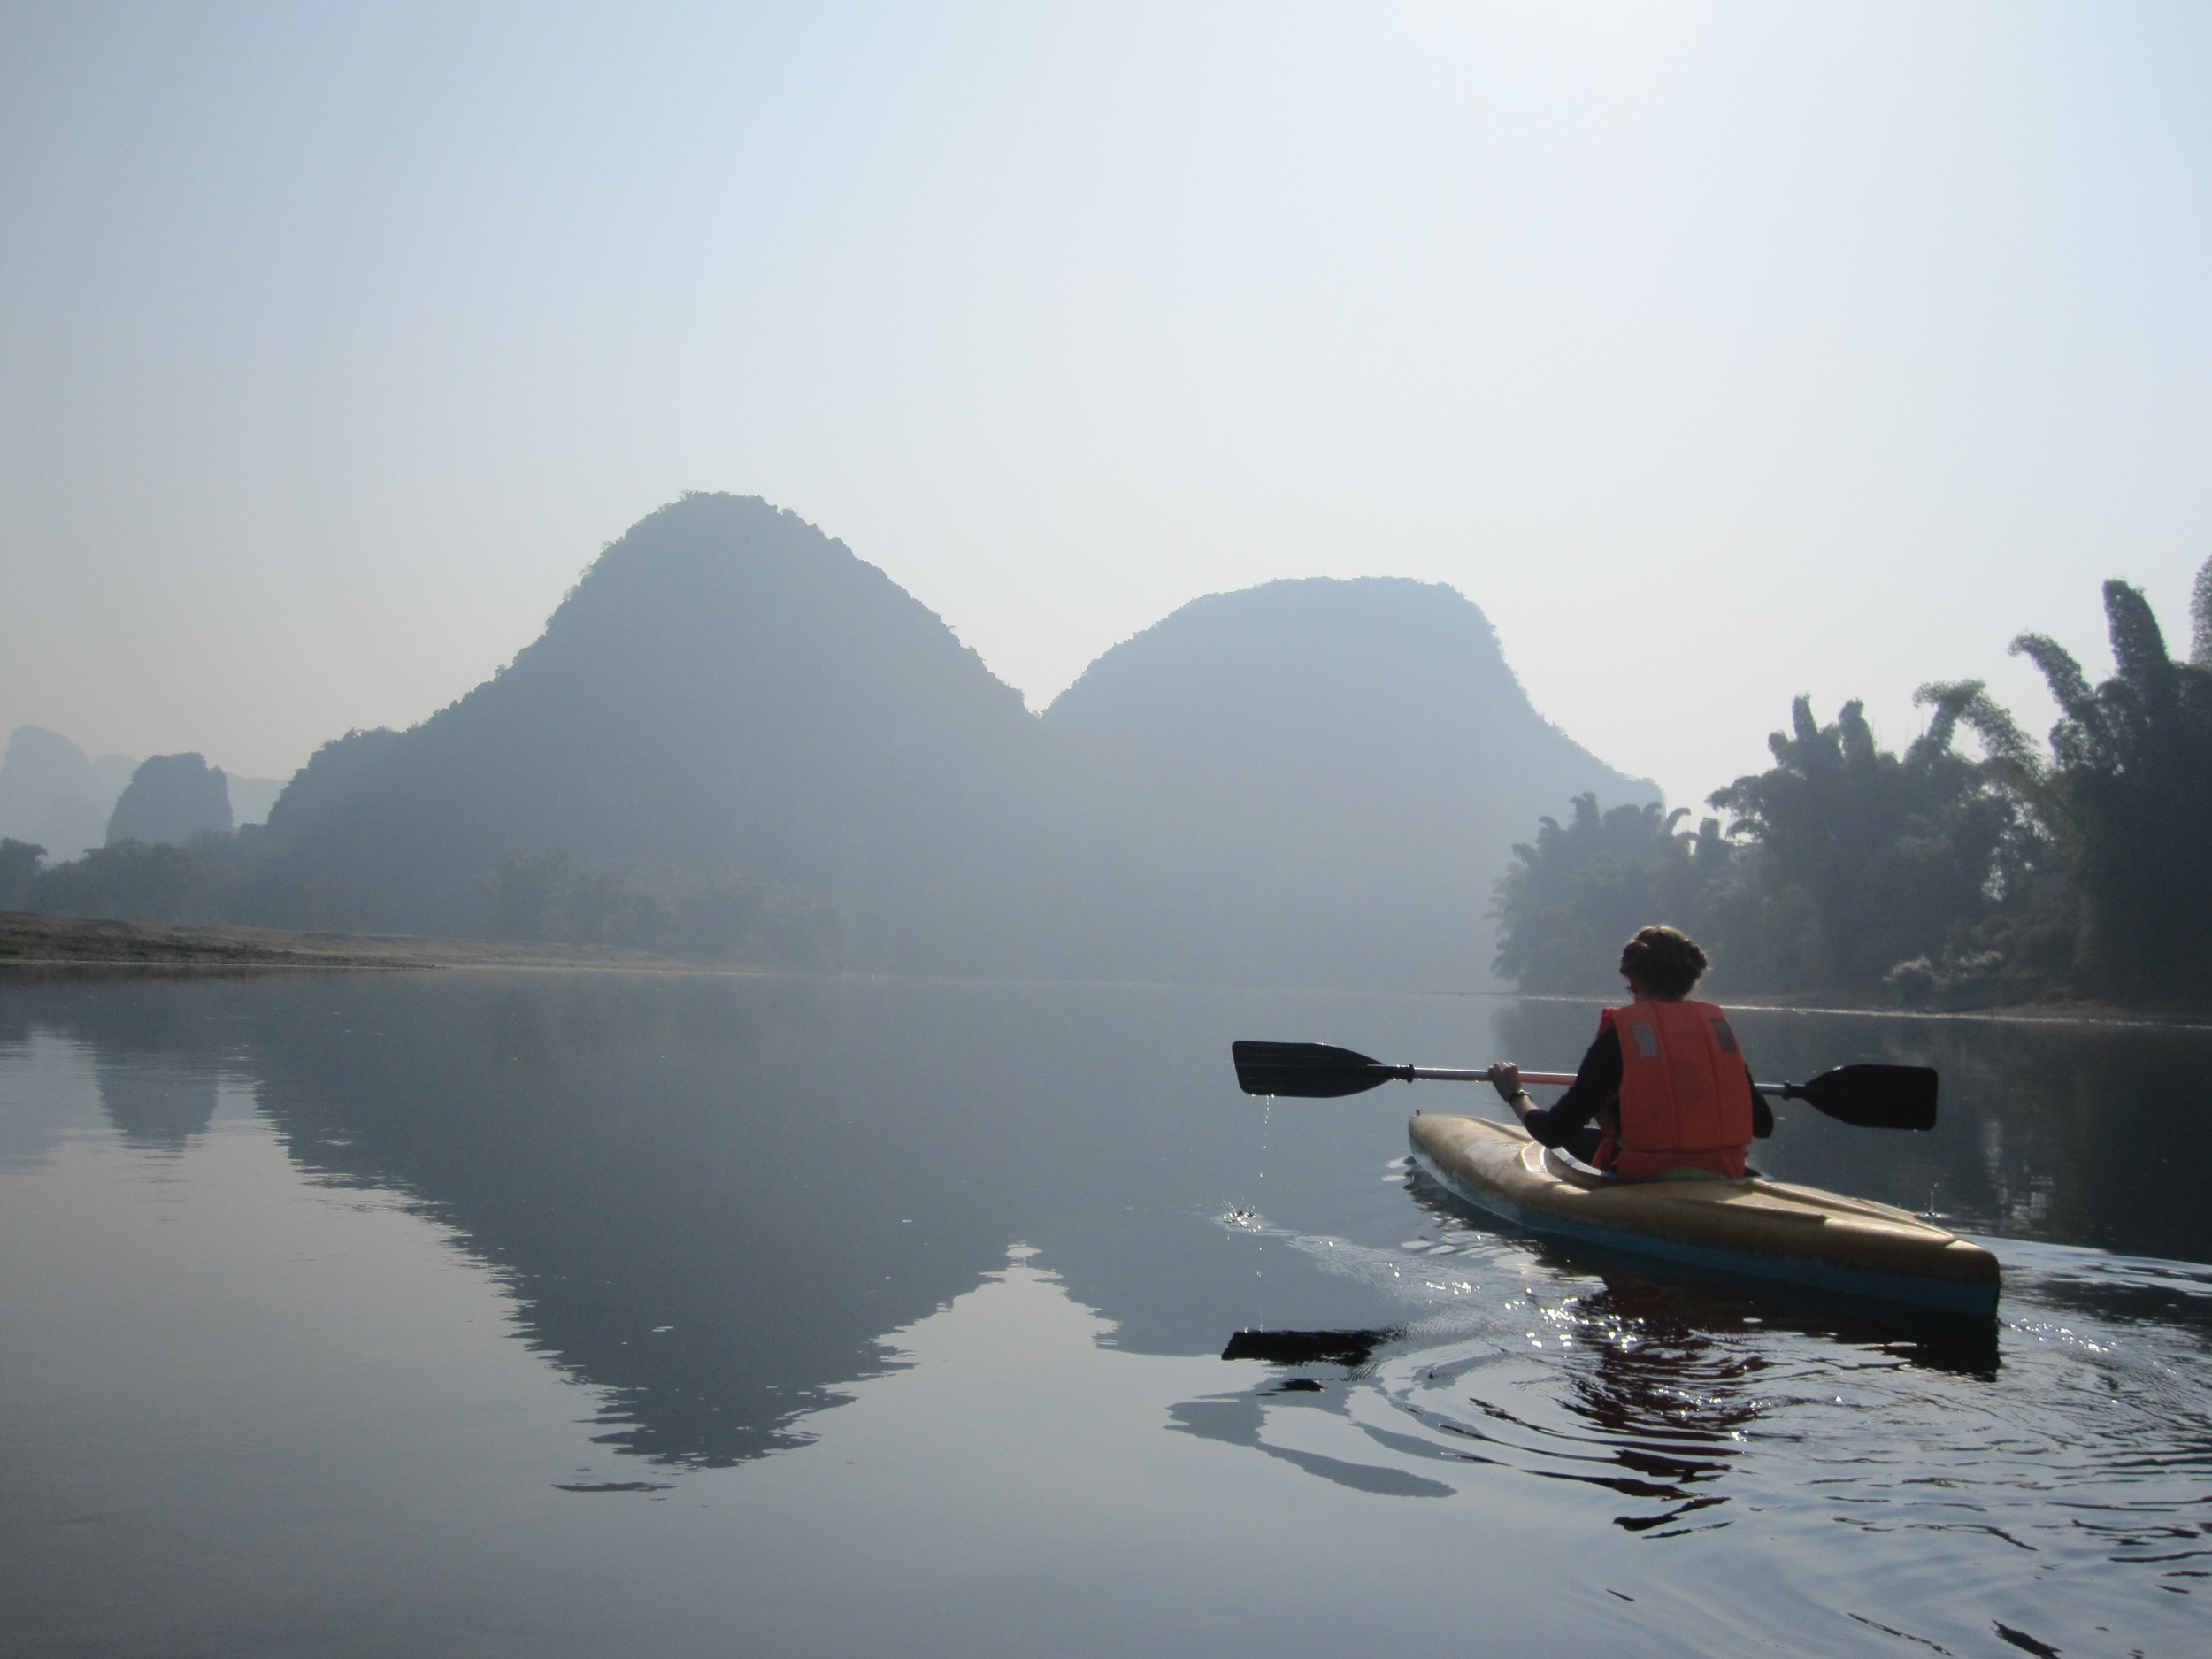 Kayaking along the Li river.